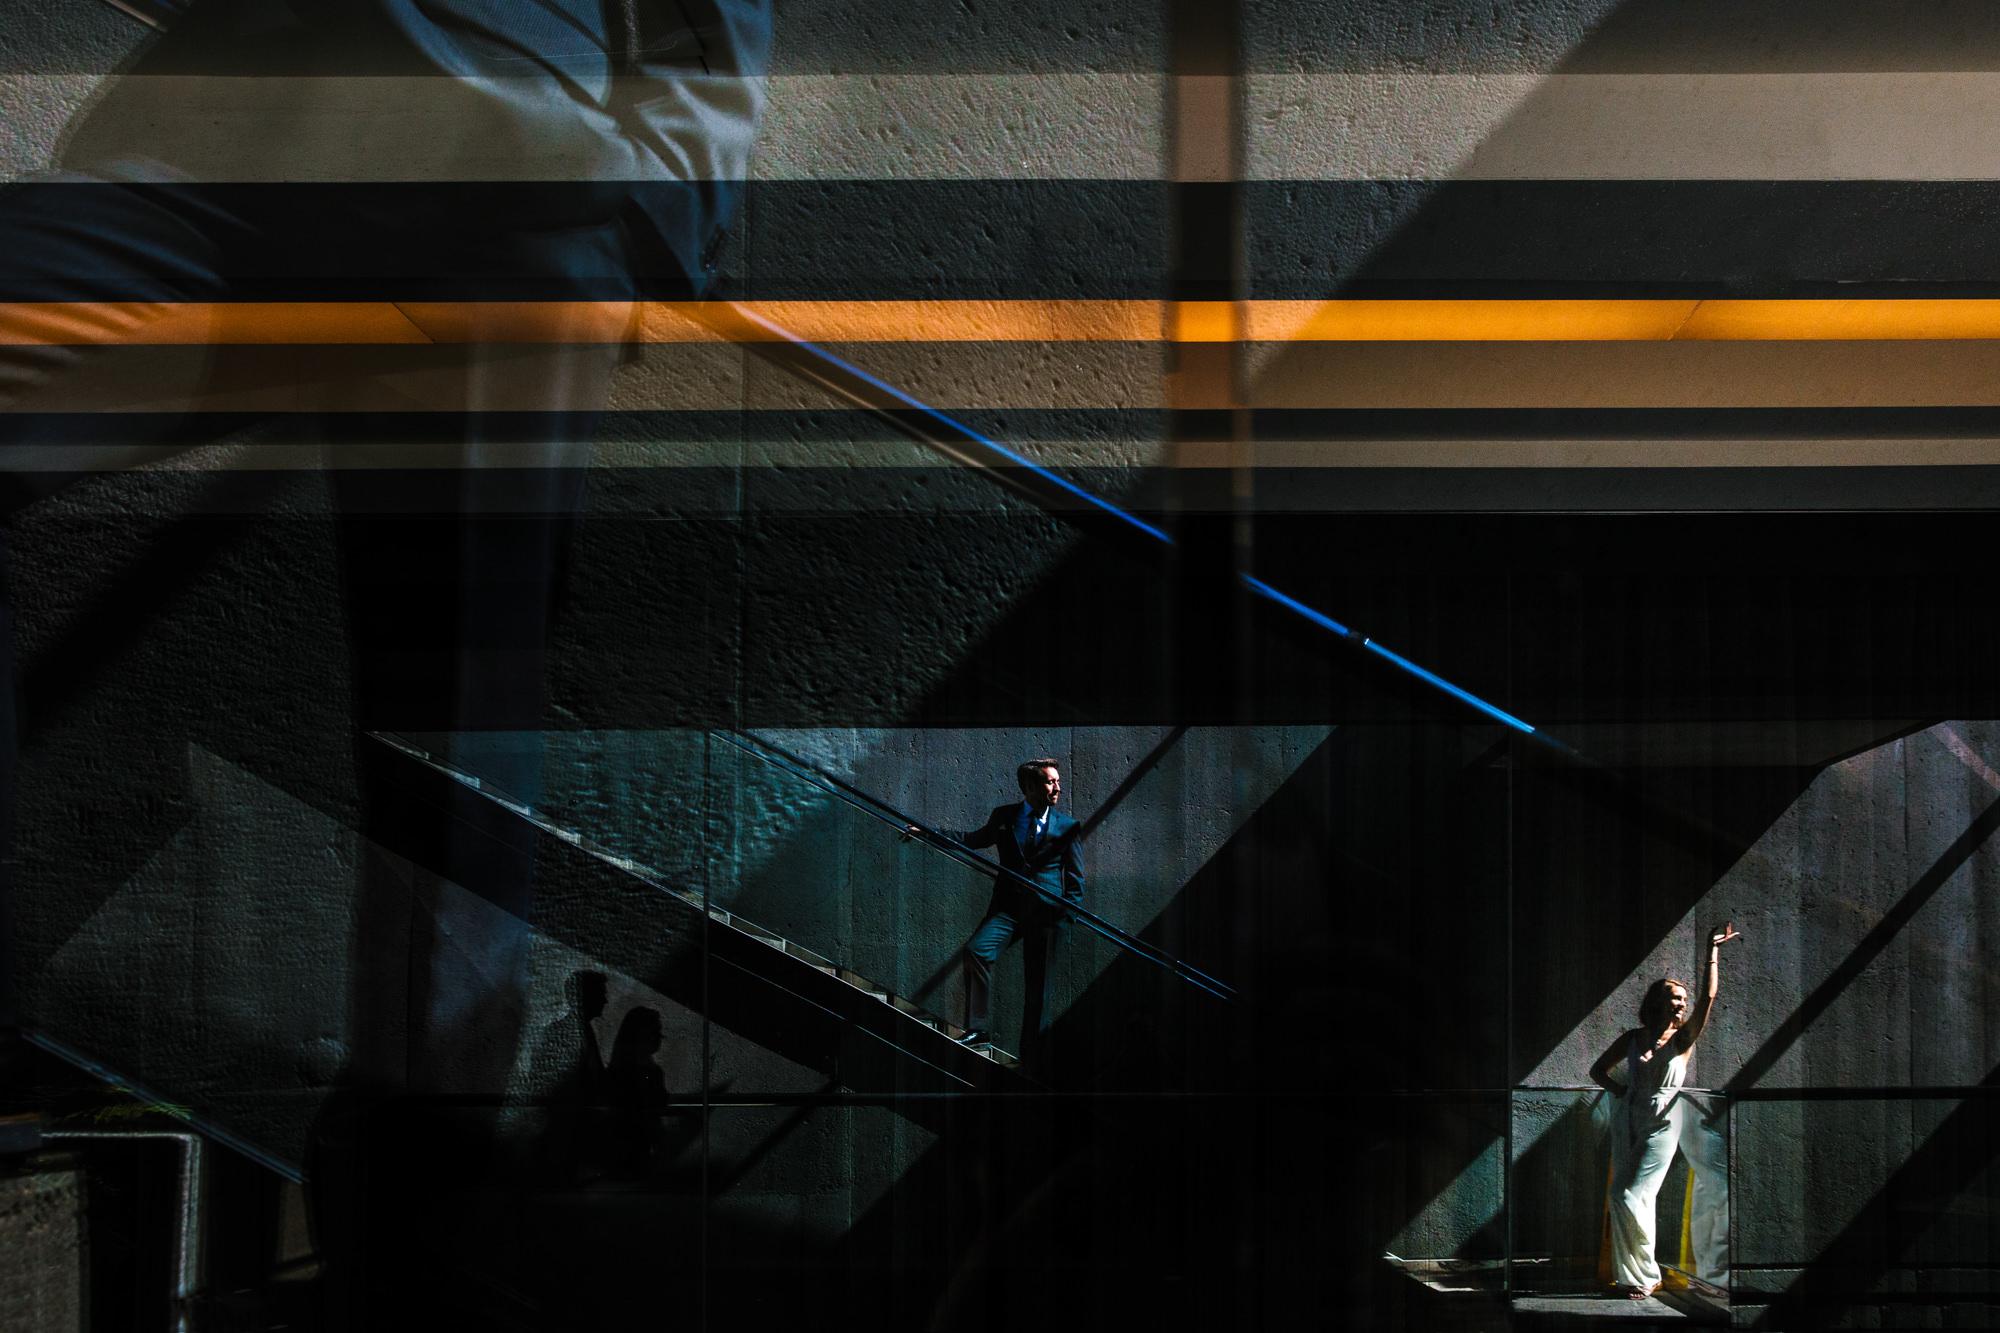 Bride waves goodbye at bottom of escalator Yves Schepers